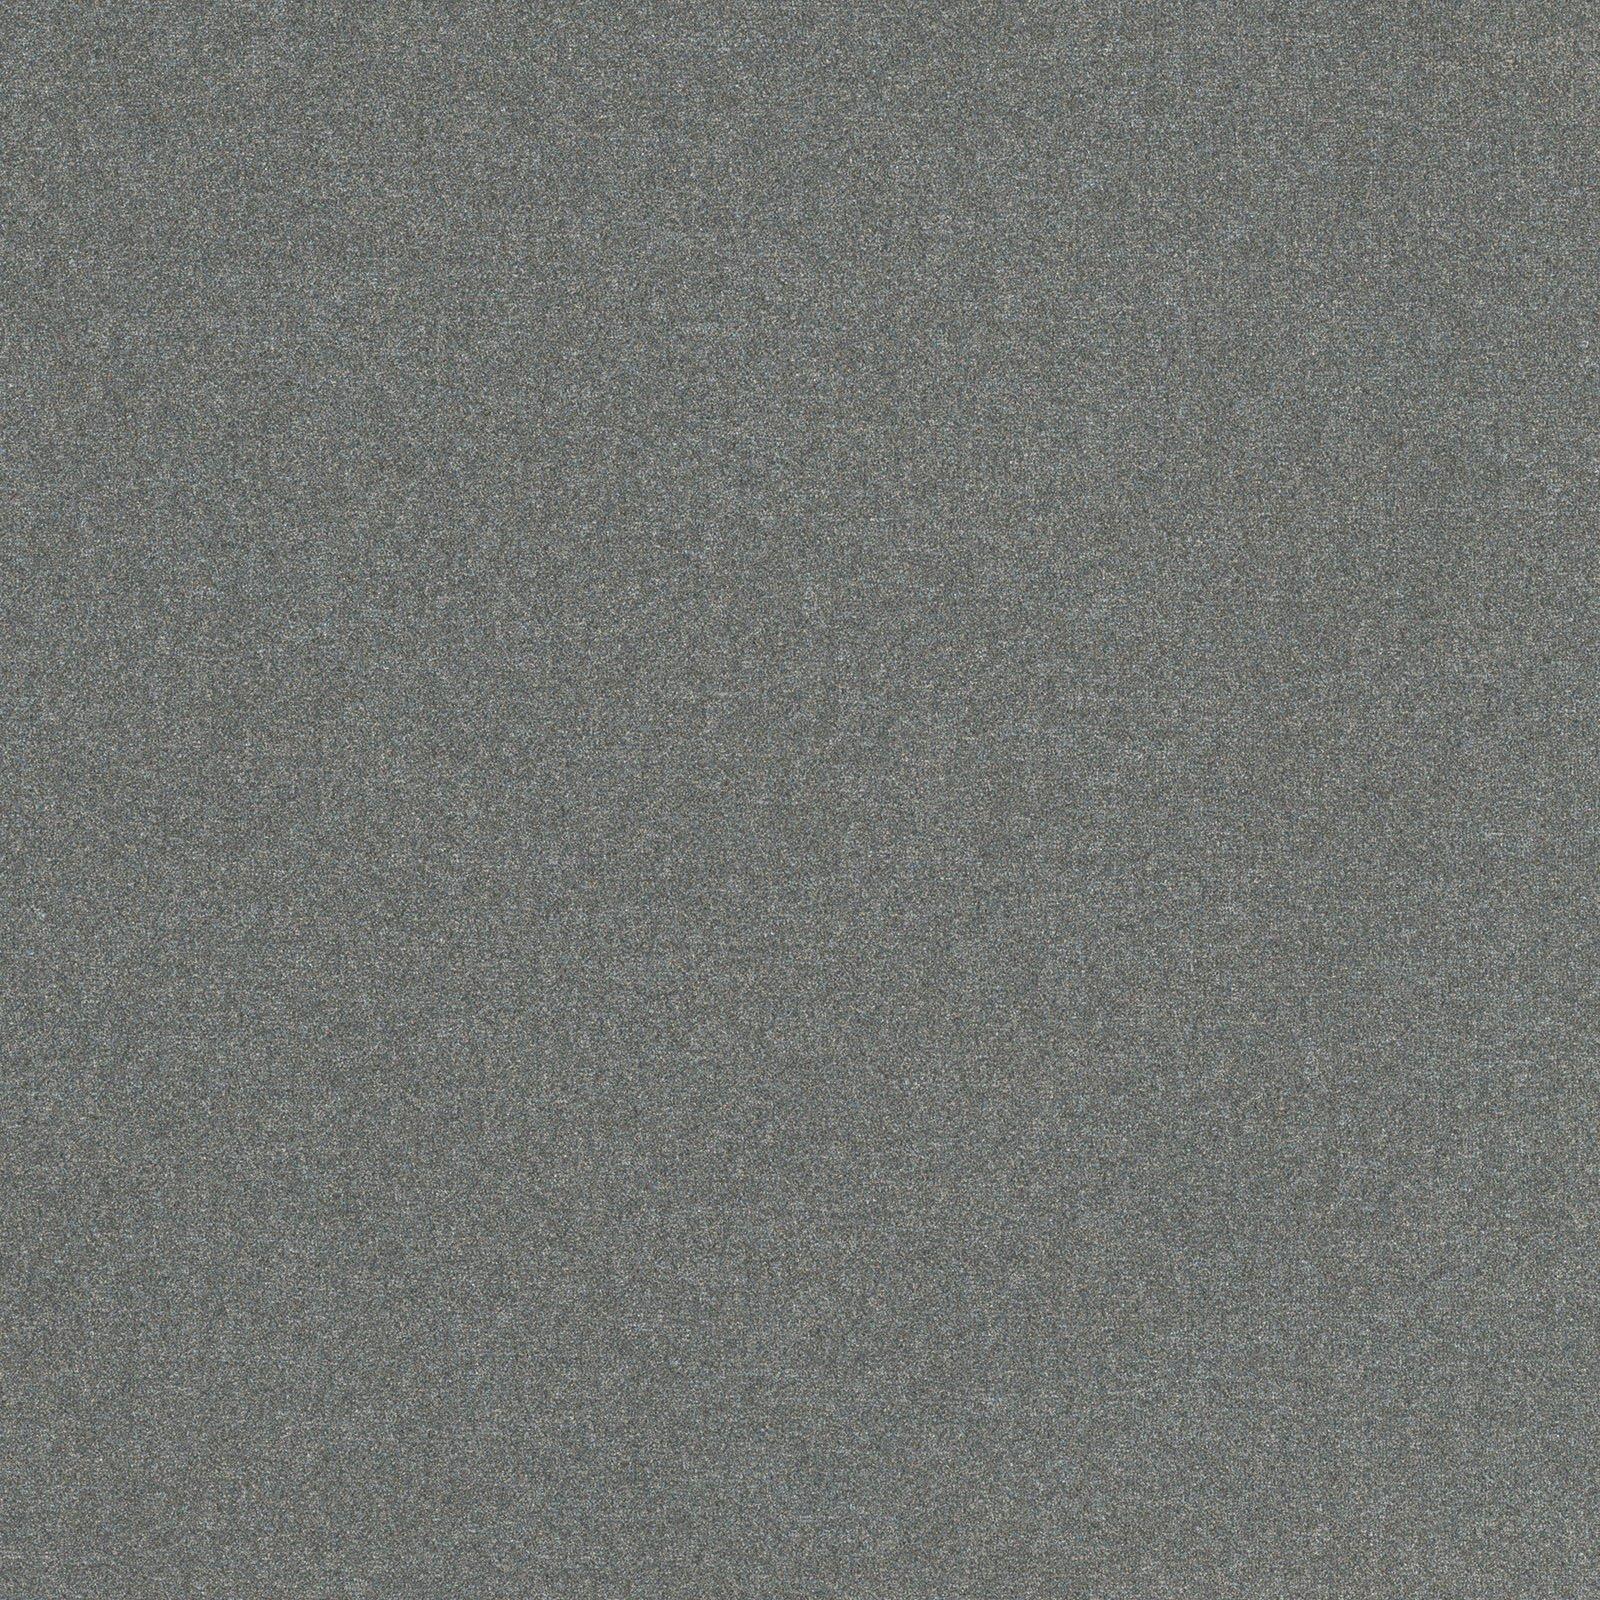 EESC-M1000 K2 - STARLIGHT METALLICS BY MAYWOOD STUDIO GUNMETAL - AVAILABLE TO ORDER